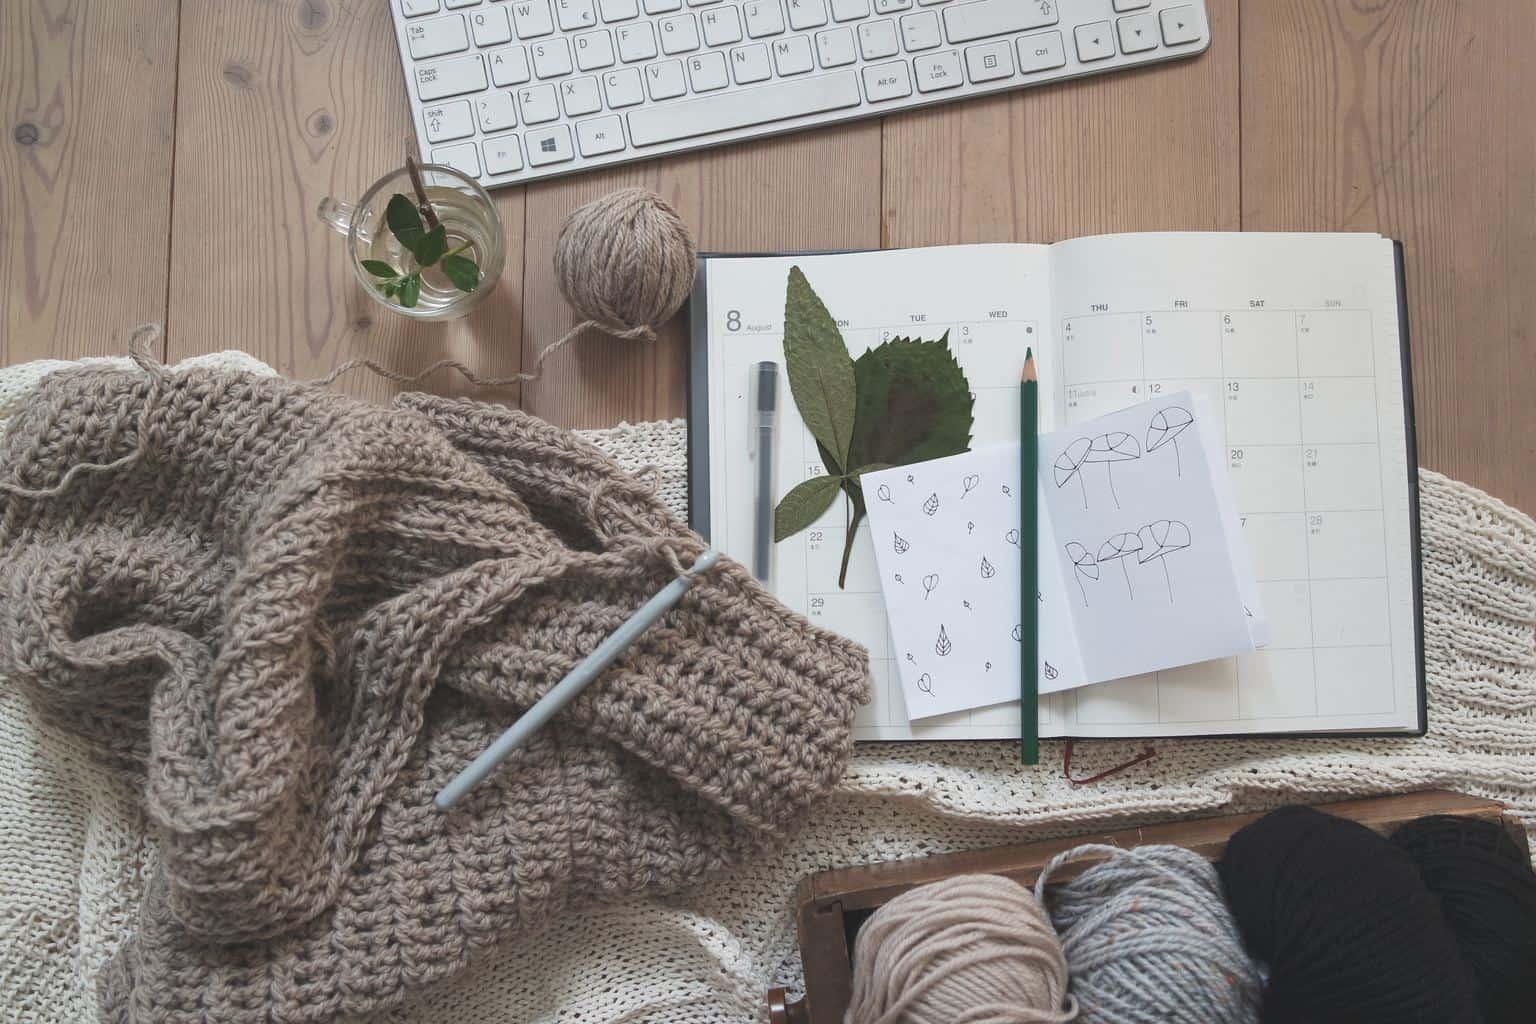 Knitting - the multigenerational hobby